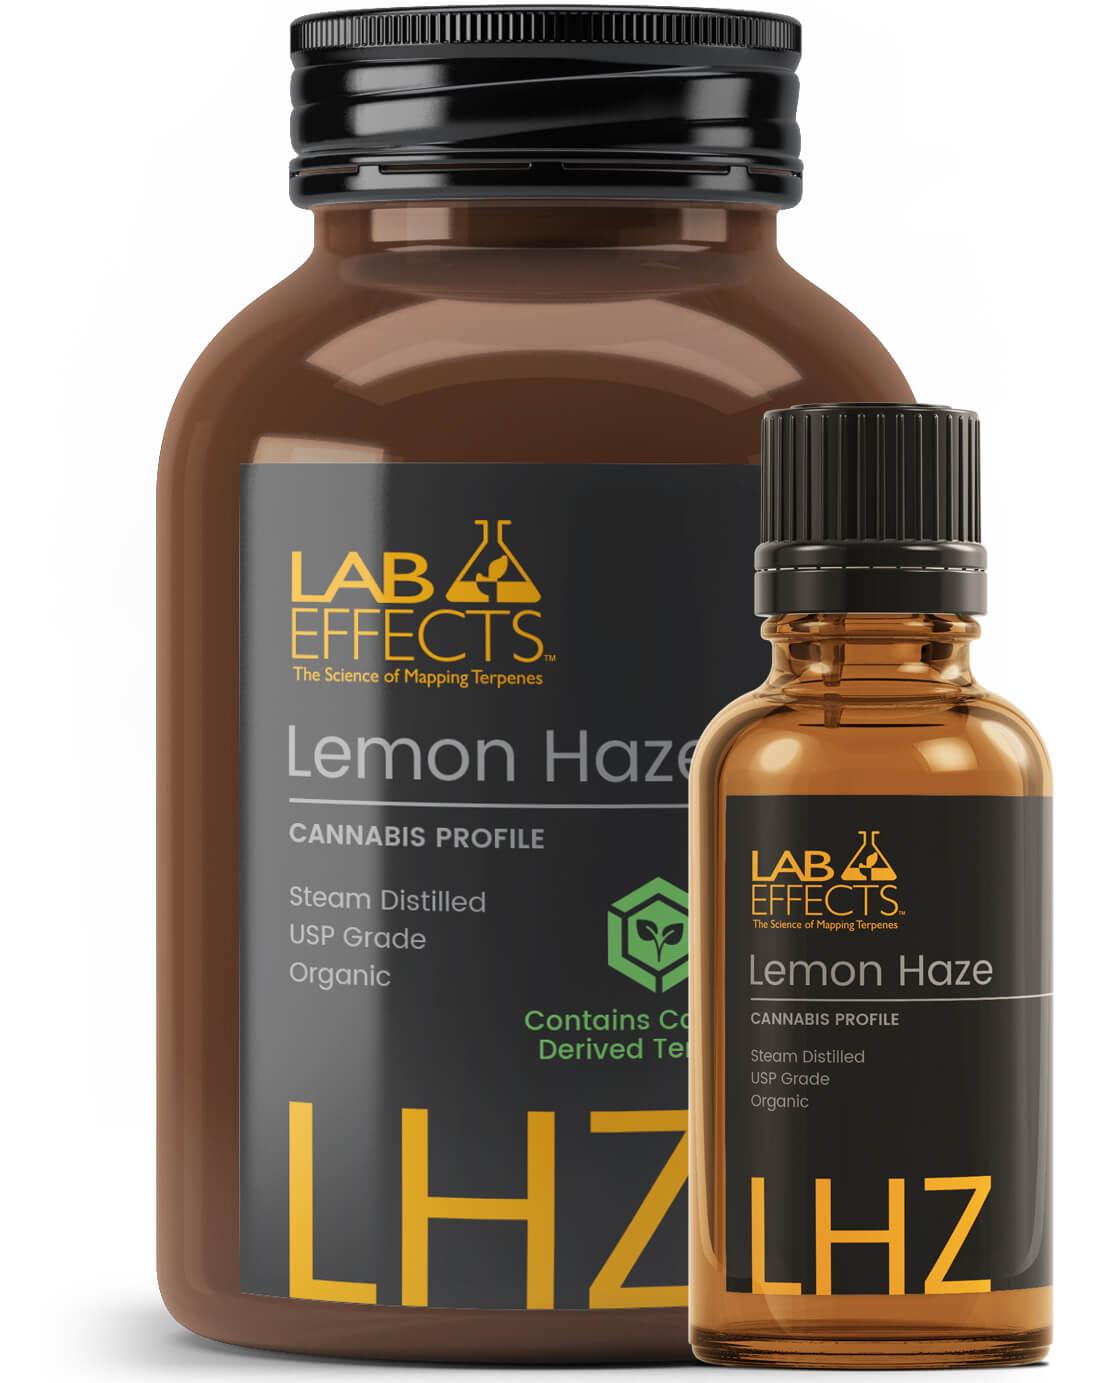 Lemon Haze Cannabis Profile Matching Terpenes Lab Effects